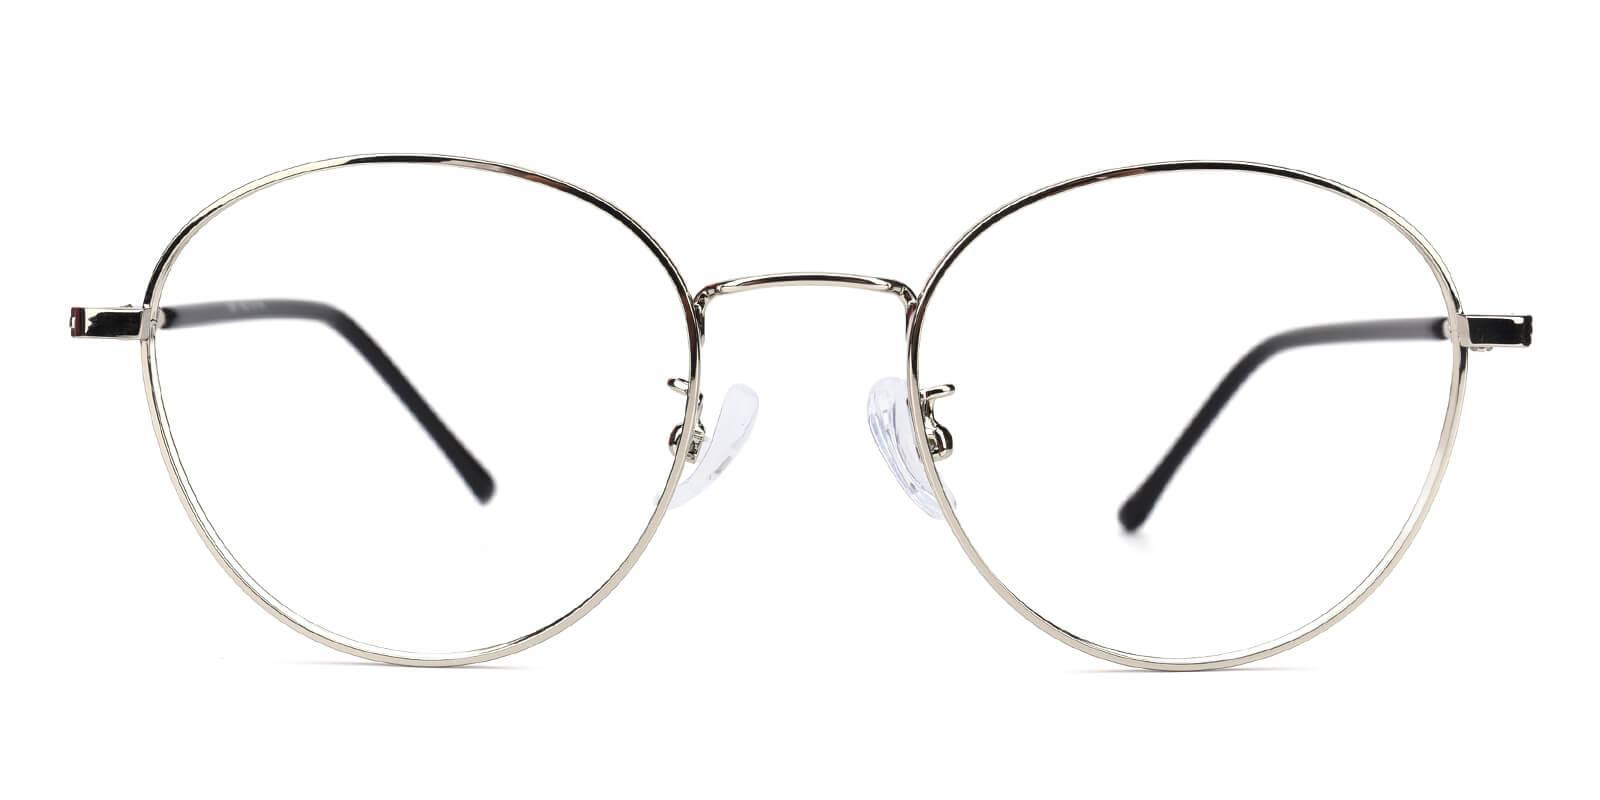 Devi-Silver-Oval-Metal-Eyeglasses-additional2